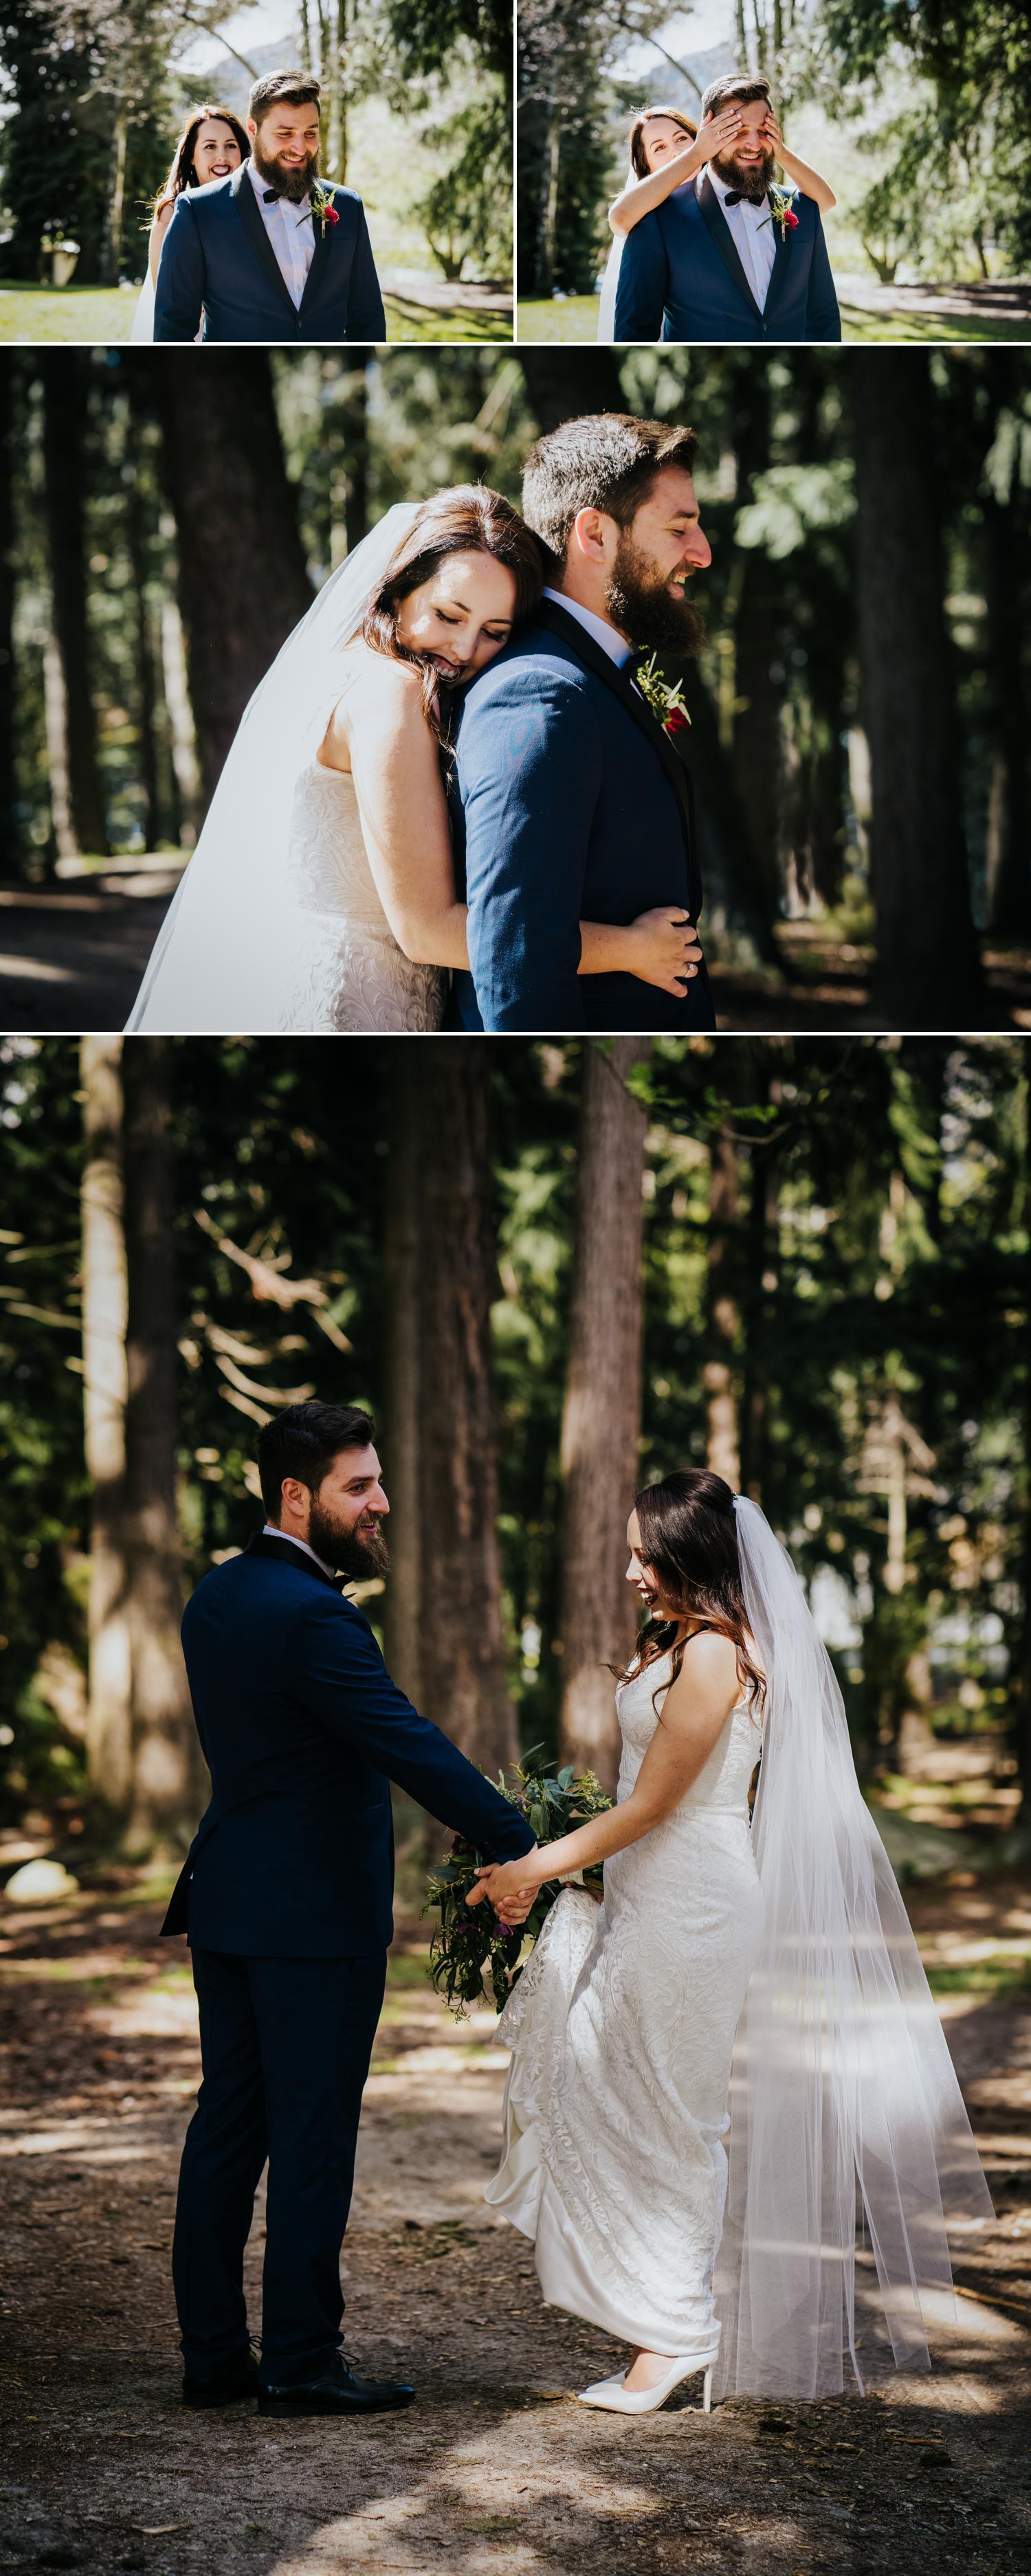 Queenstown gardens wedding photography